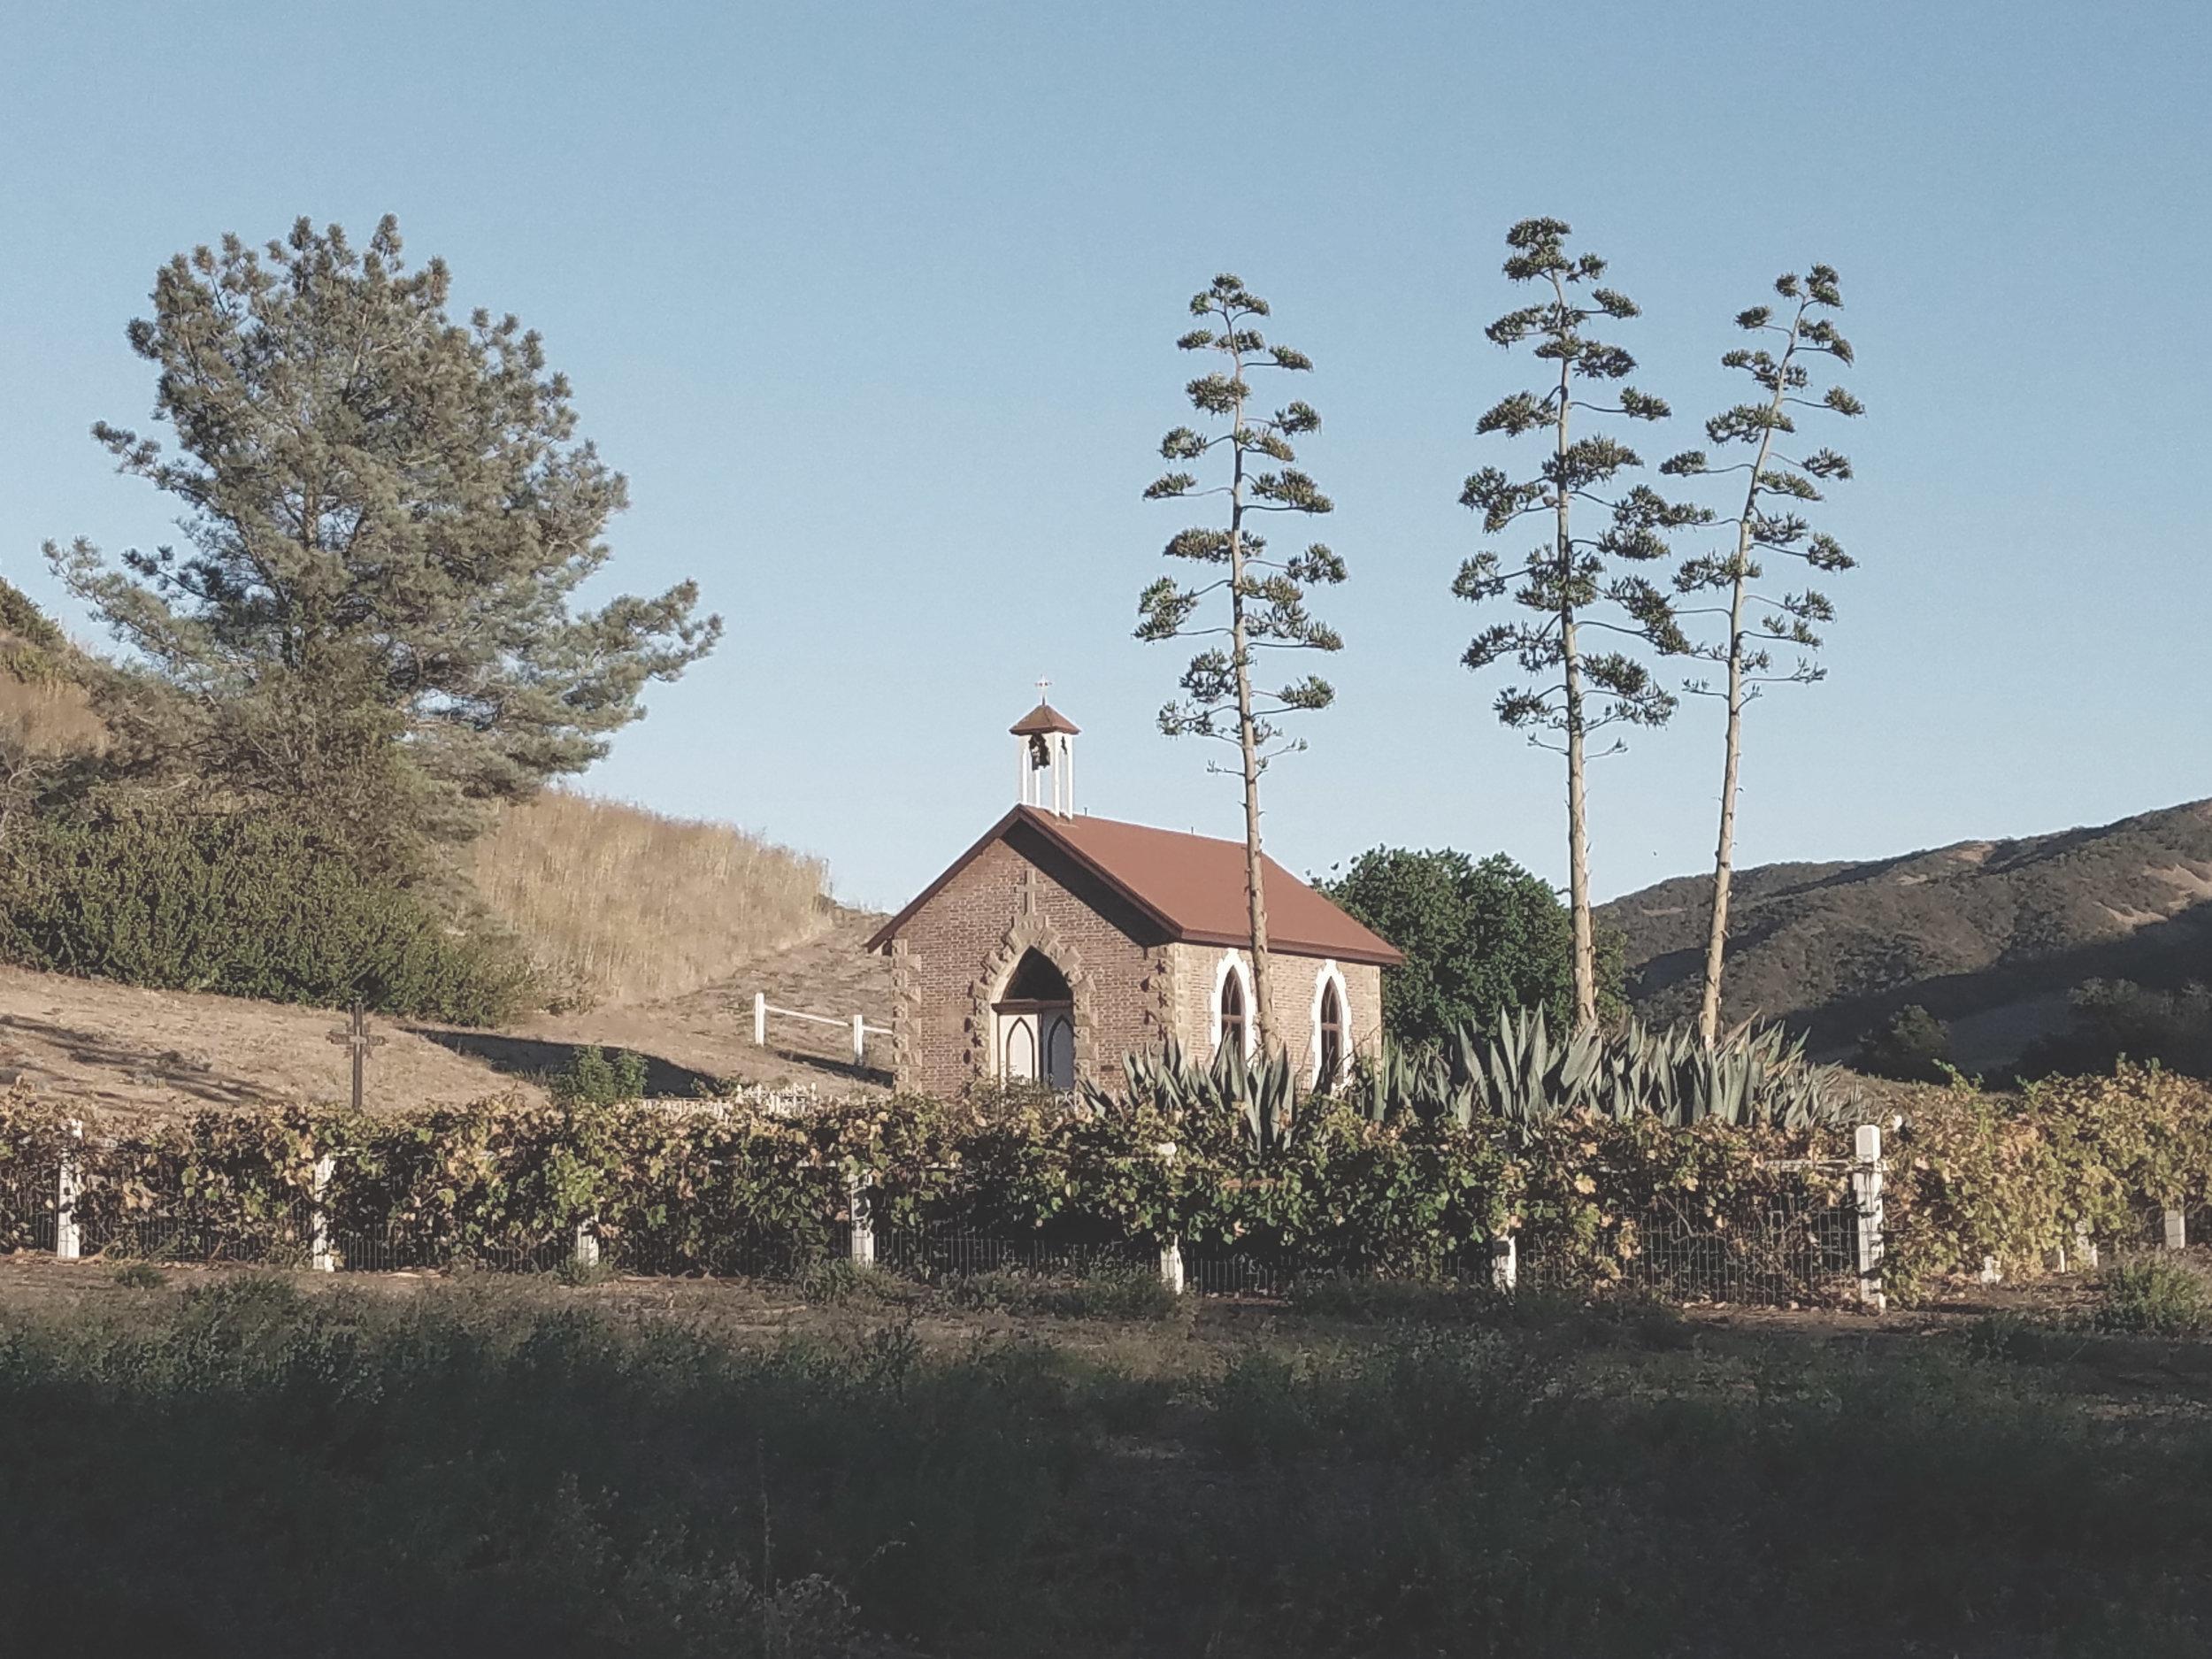 santa cruz island landscape architecture ten over studio.jpg